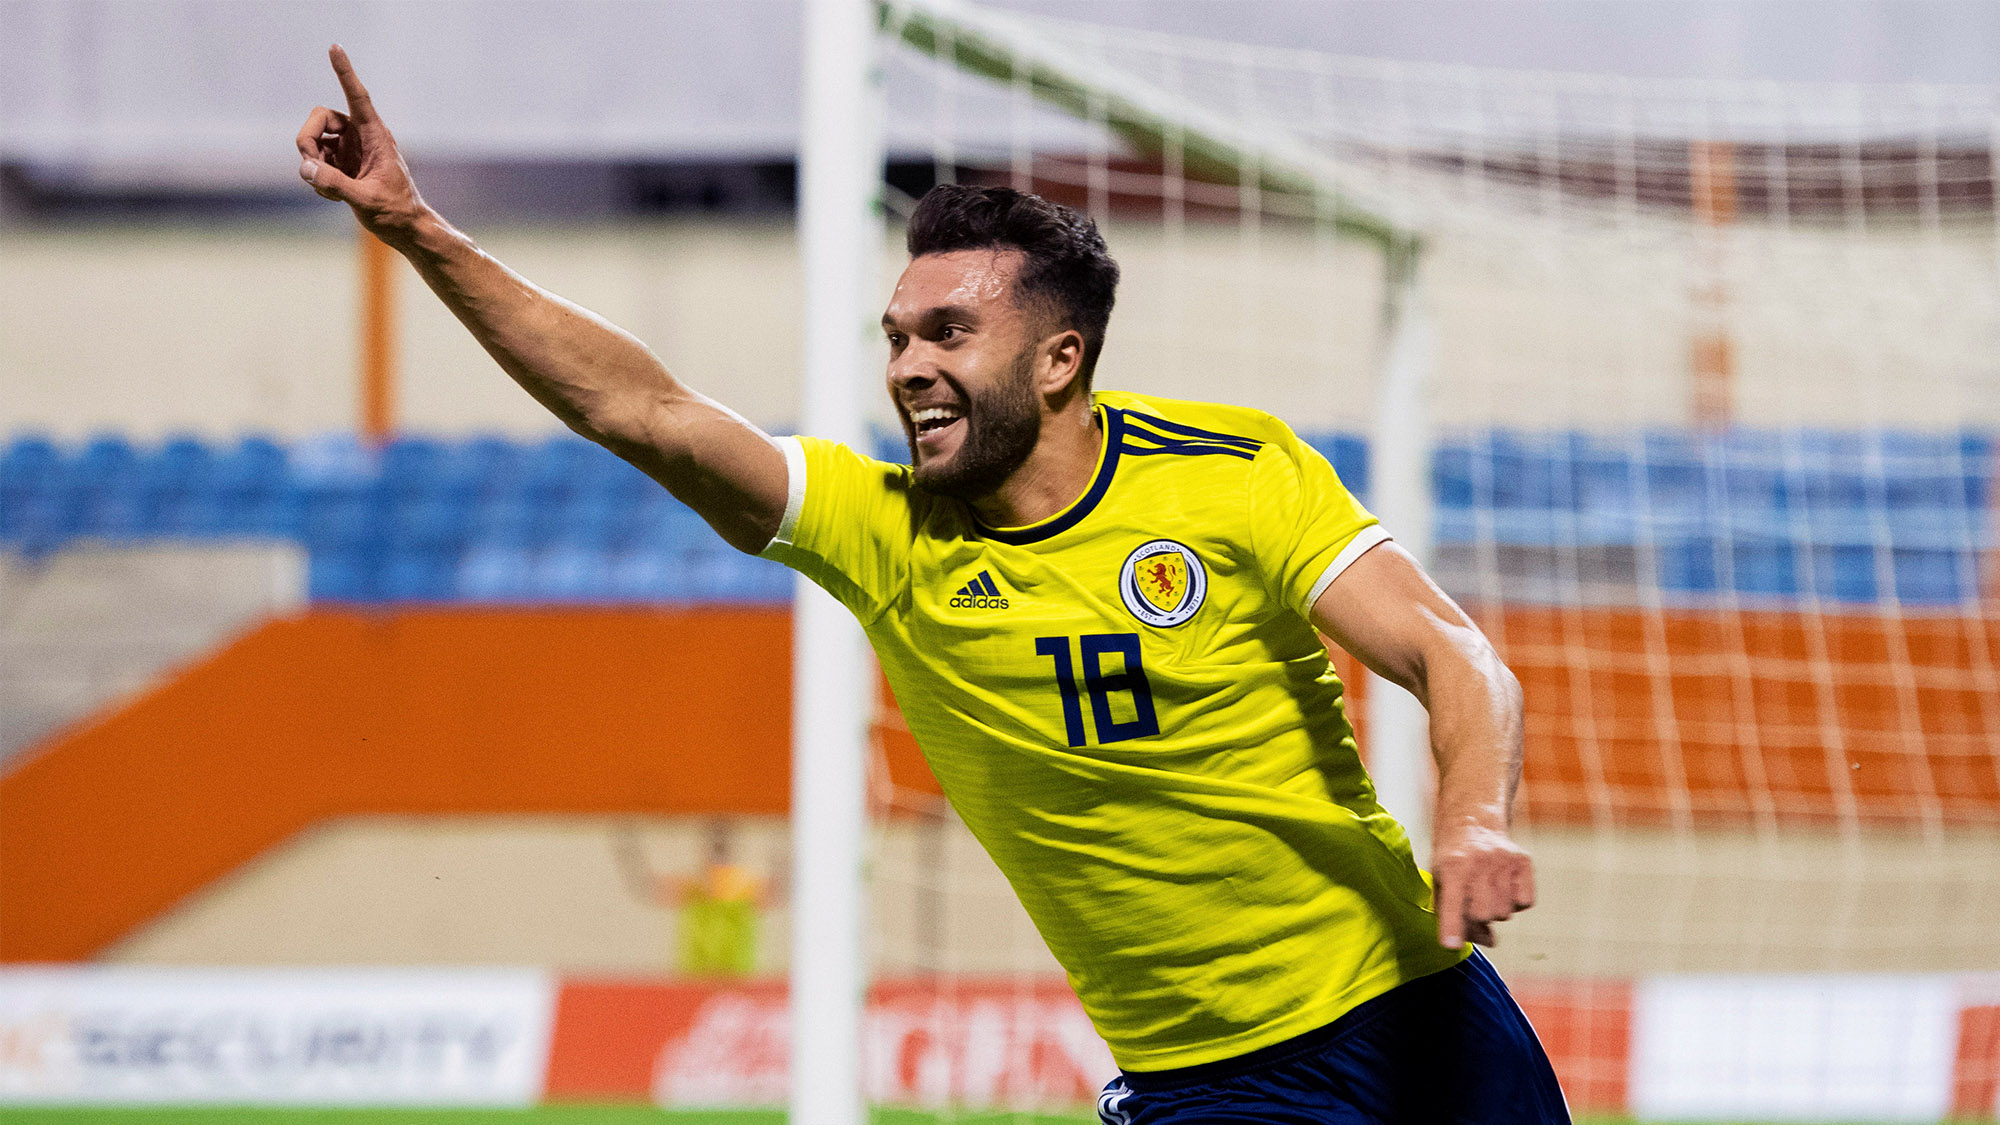 U21s | Connor stars as Scots produce stunning win